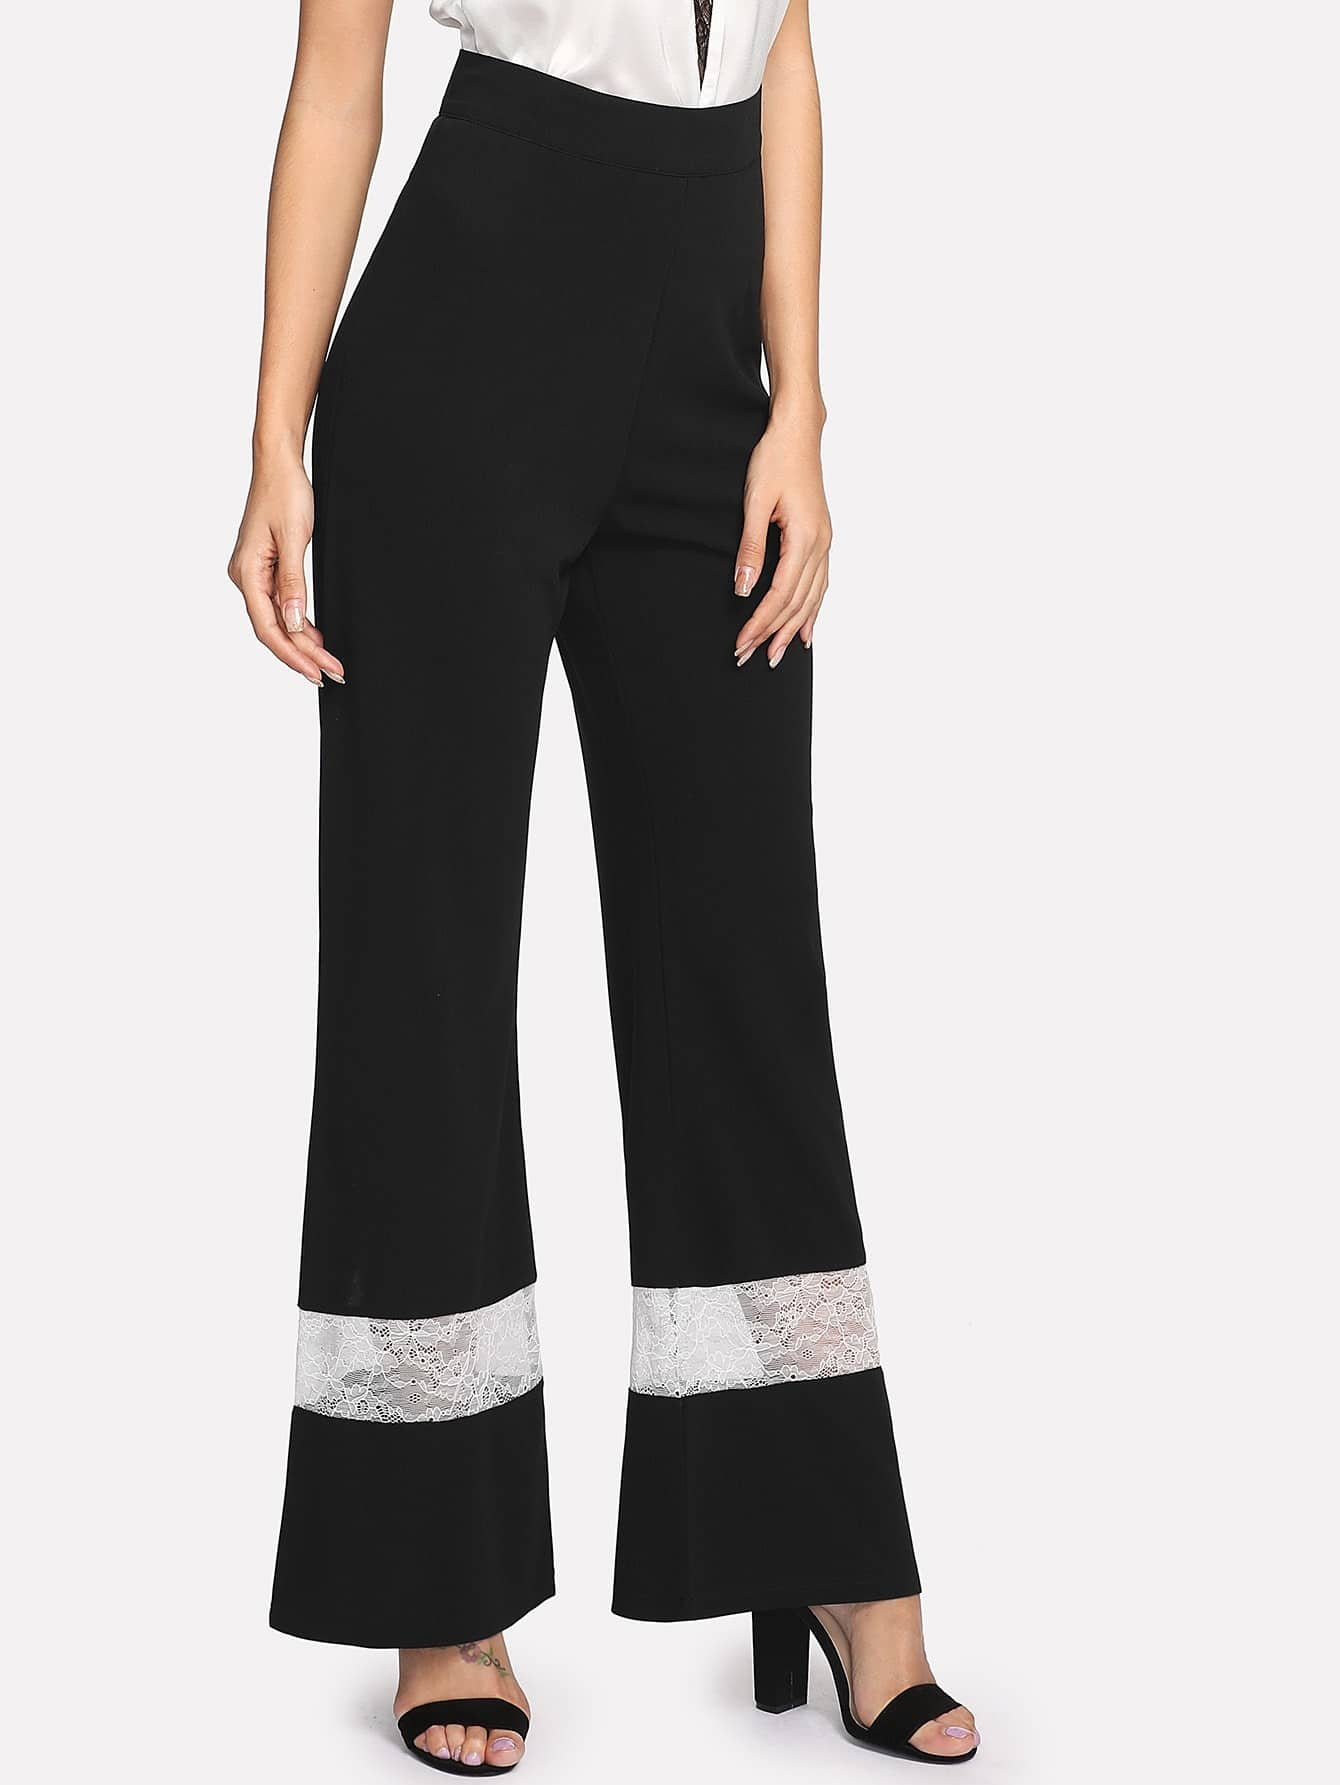 Image of Contrast Lace Wide Leg Pants